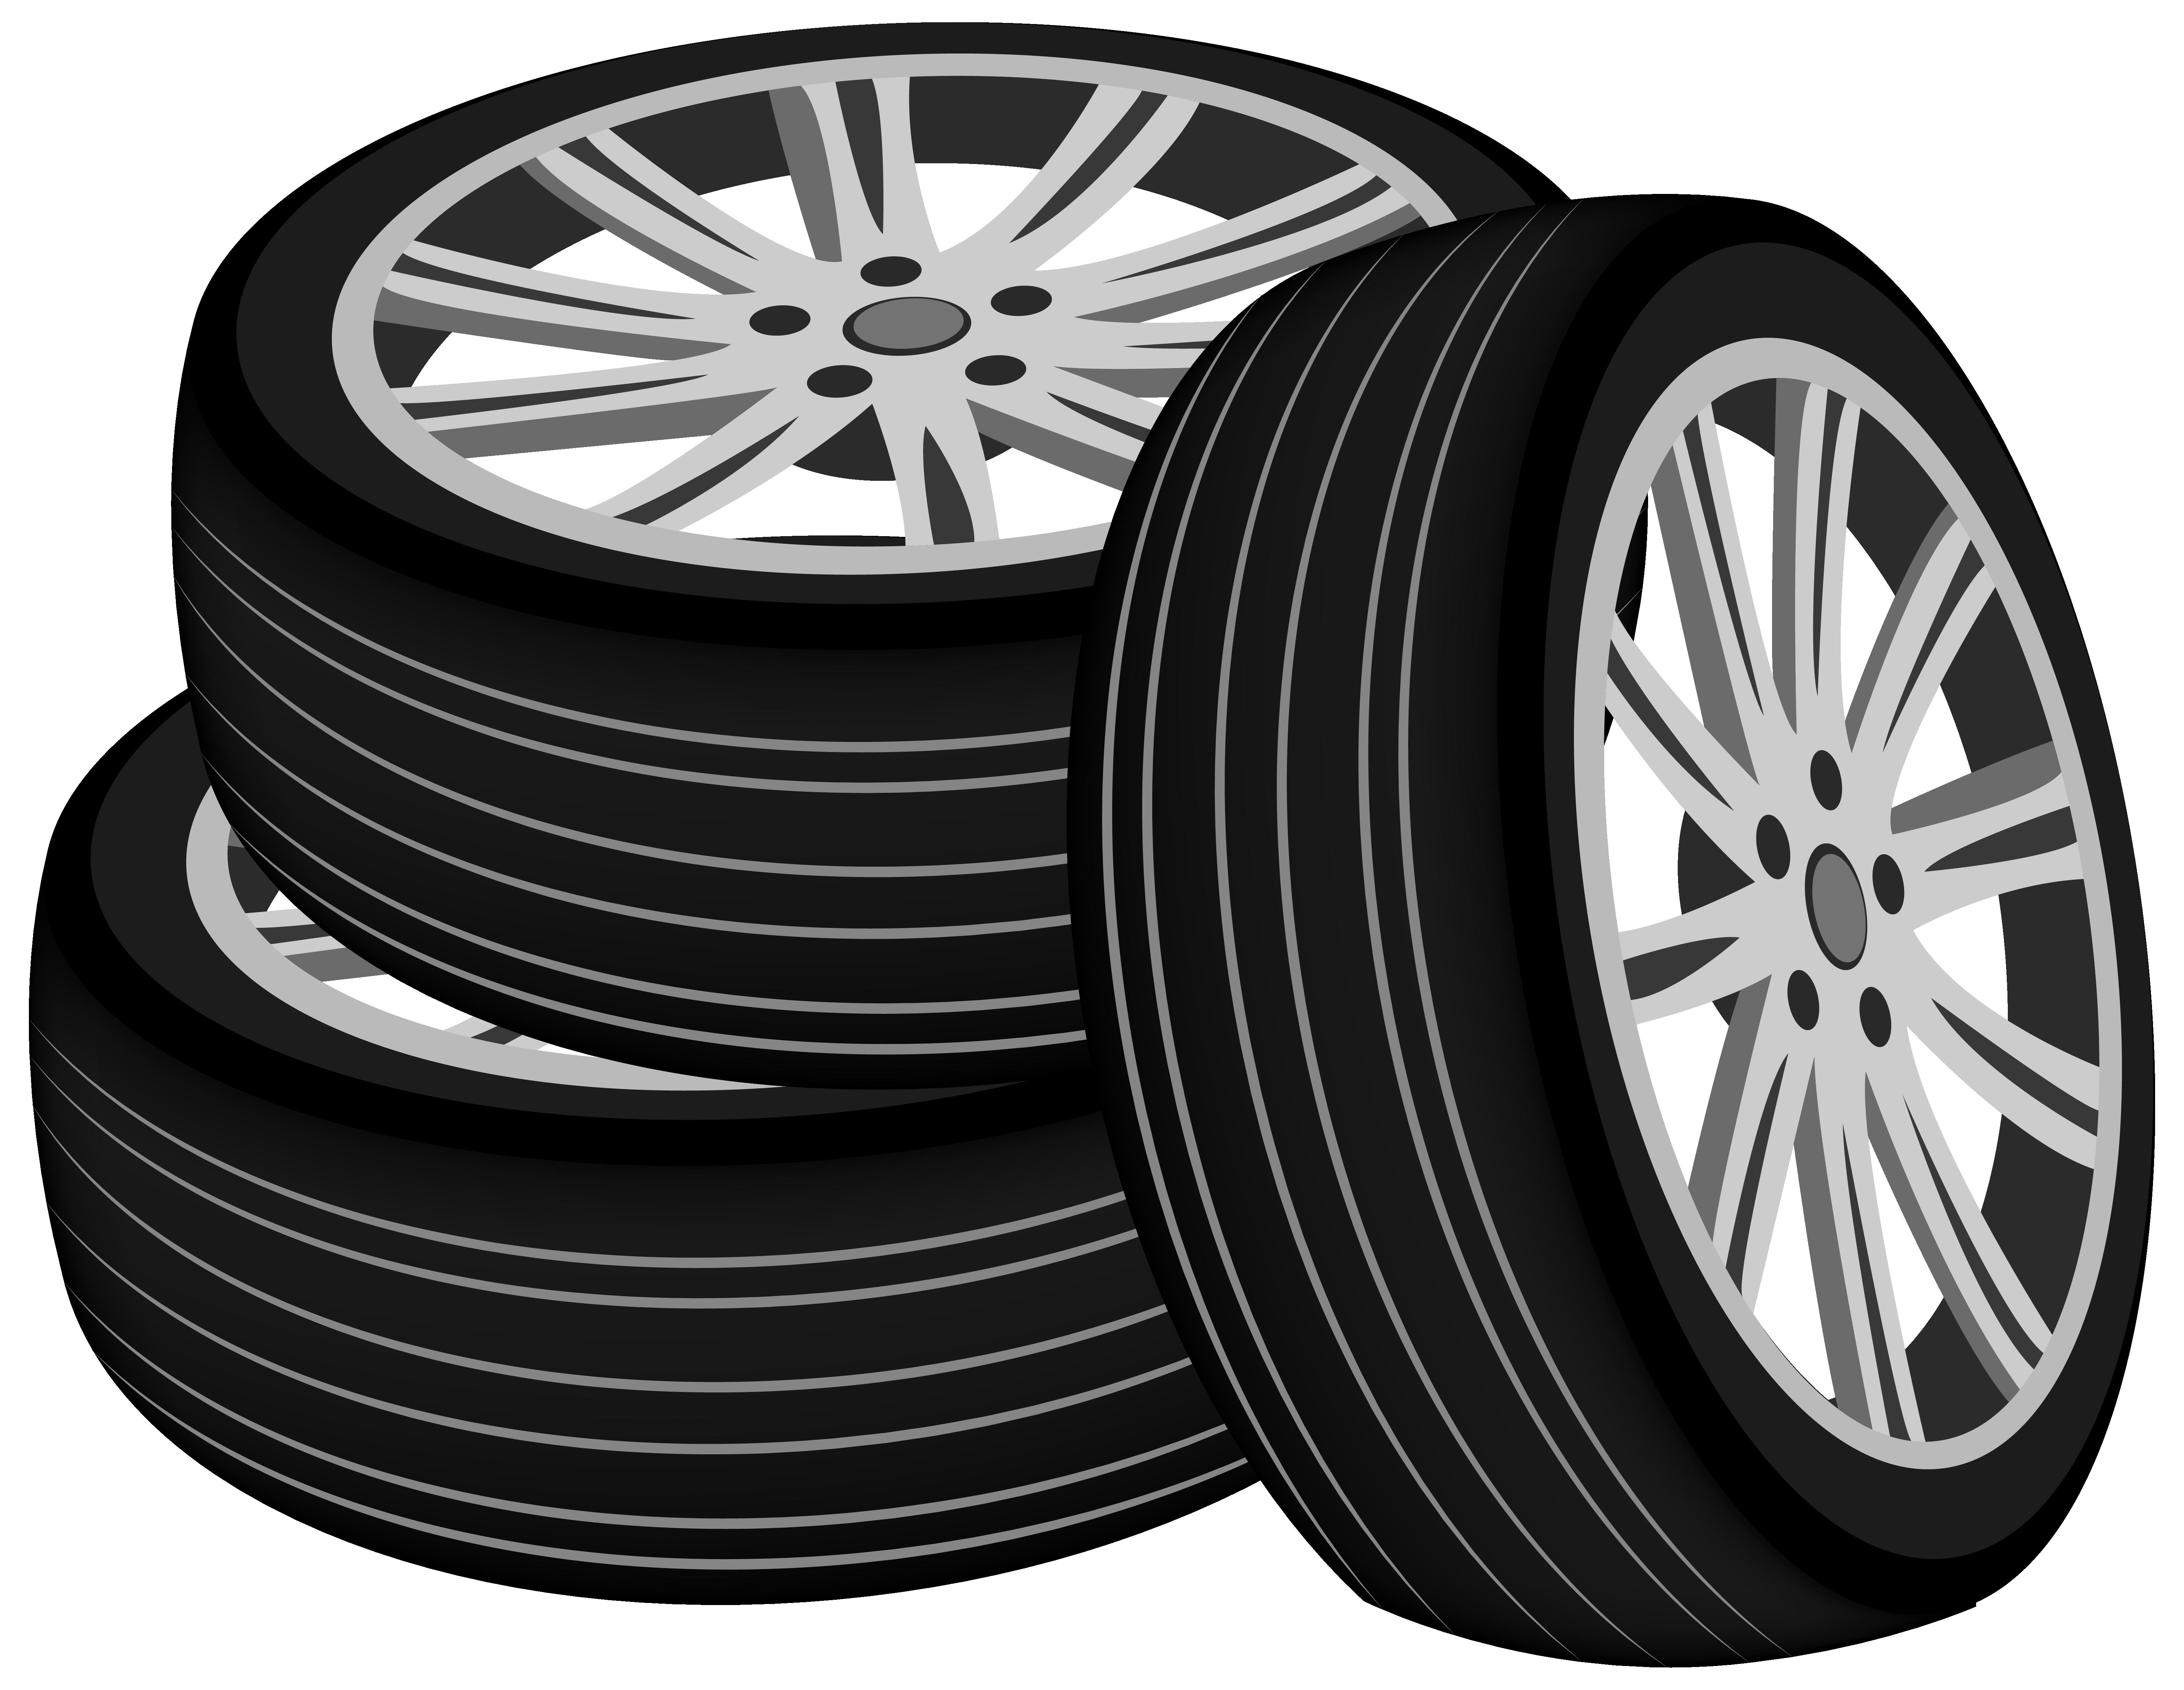 Tires clipart. Png best web